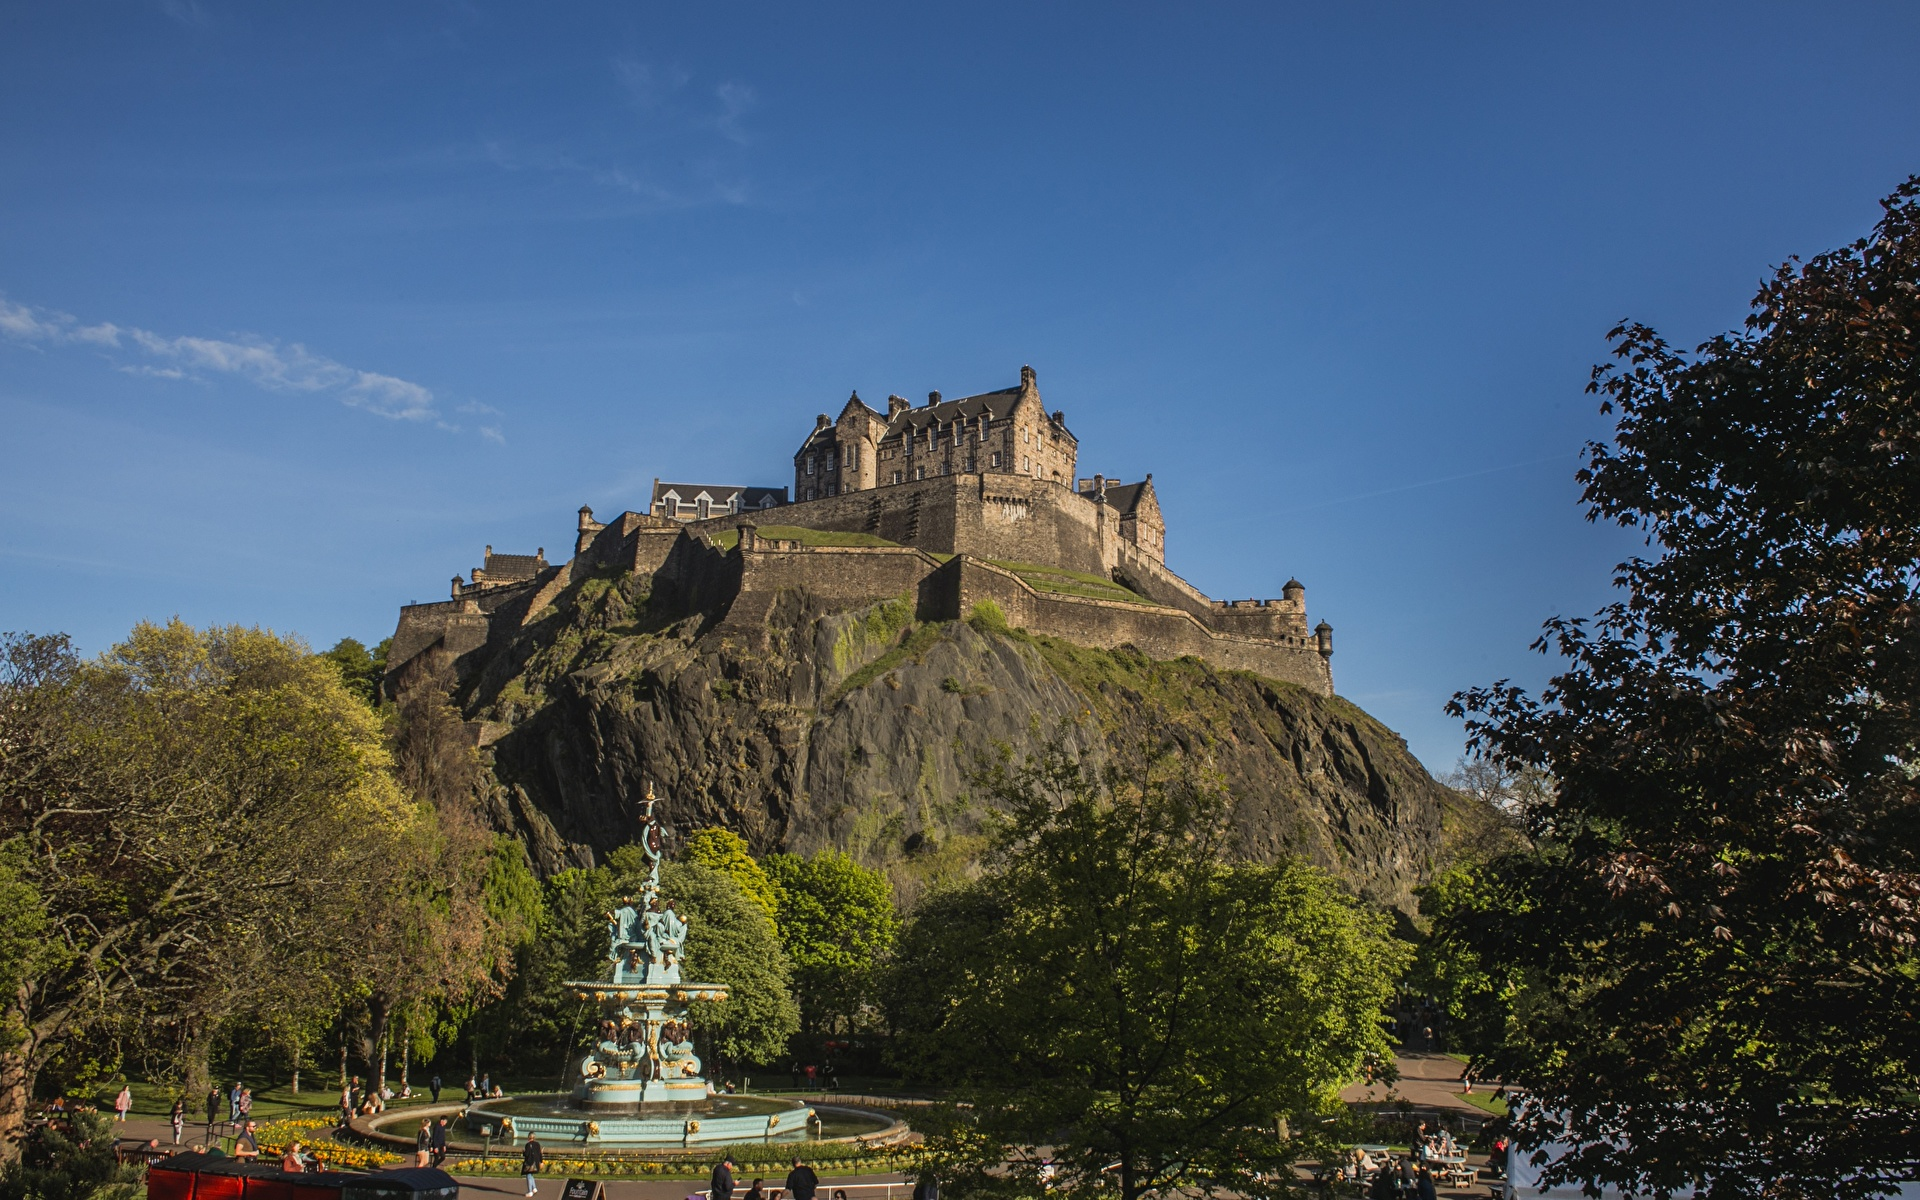 Tapeta Szkocja Fontanny Edinburgh Castle, Castle Rock Zamek Turnia miasto 1920x1200 fontanna skała skałki Miasta